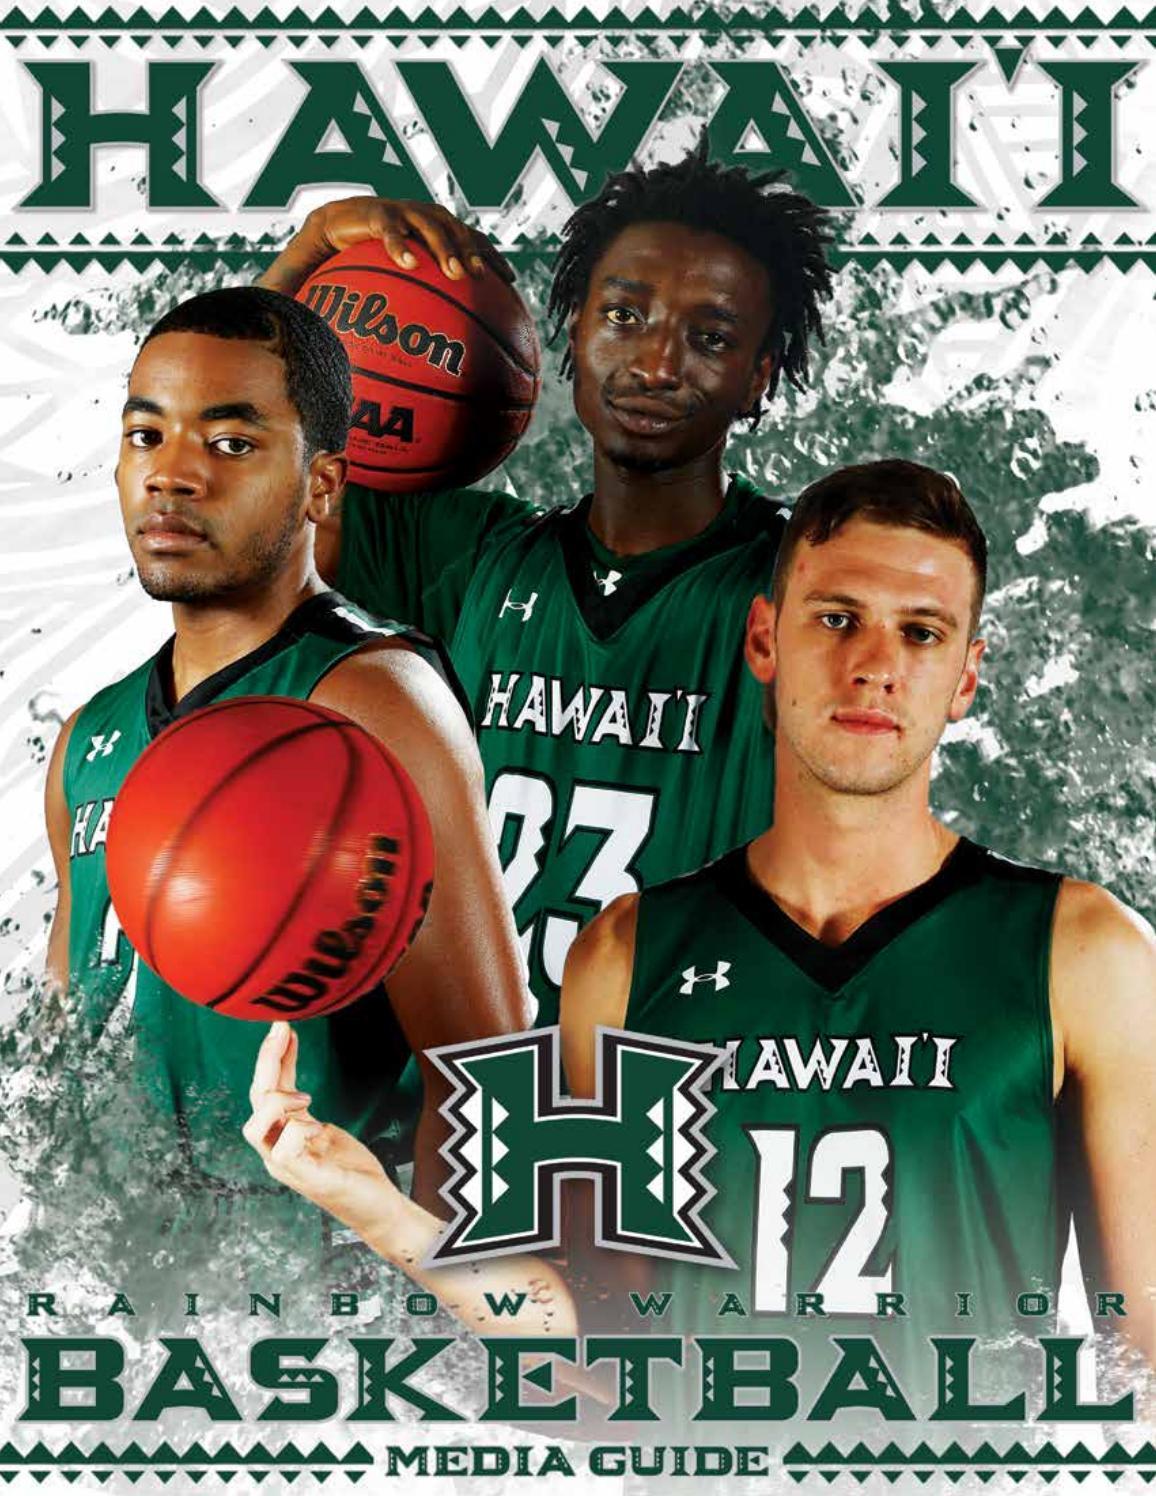 0cb0f9a5cf7 2018-19 Hawaii Men's Basketball Media Guide by hawaiiathletics1  hawaiiathletics1 - issuu